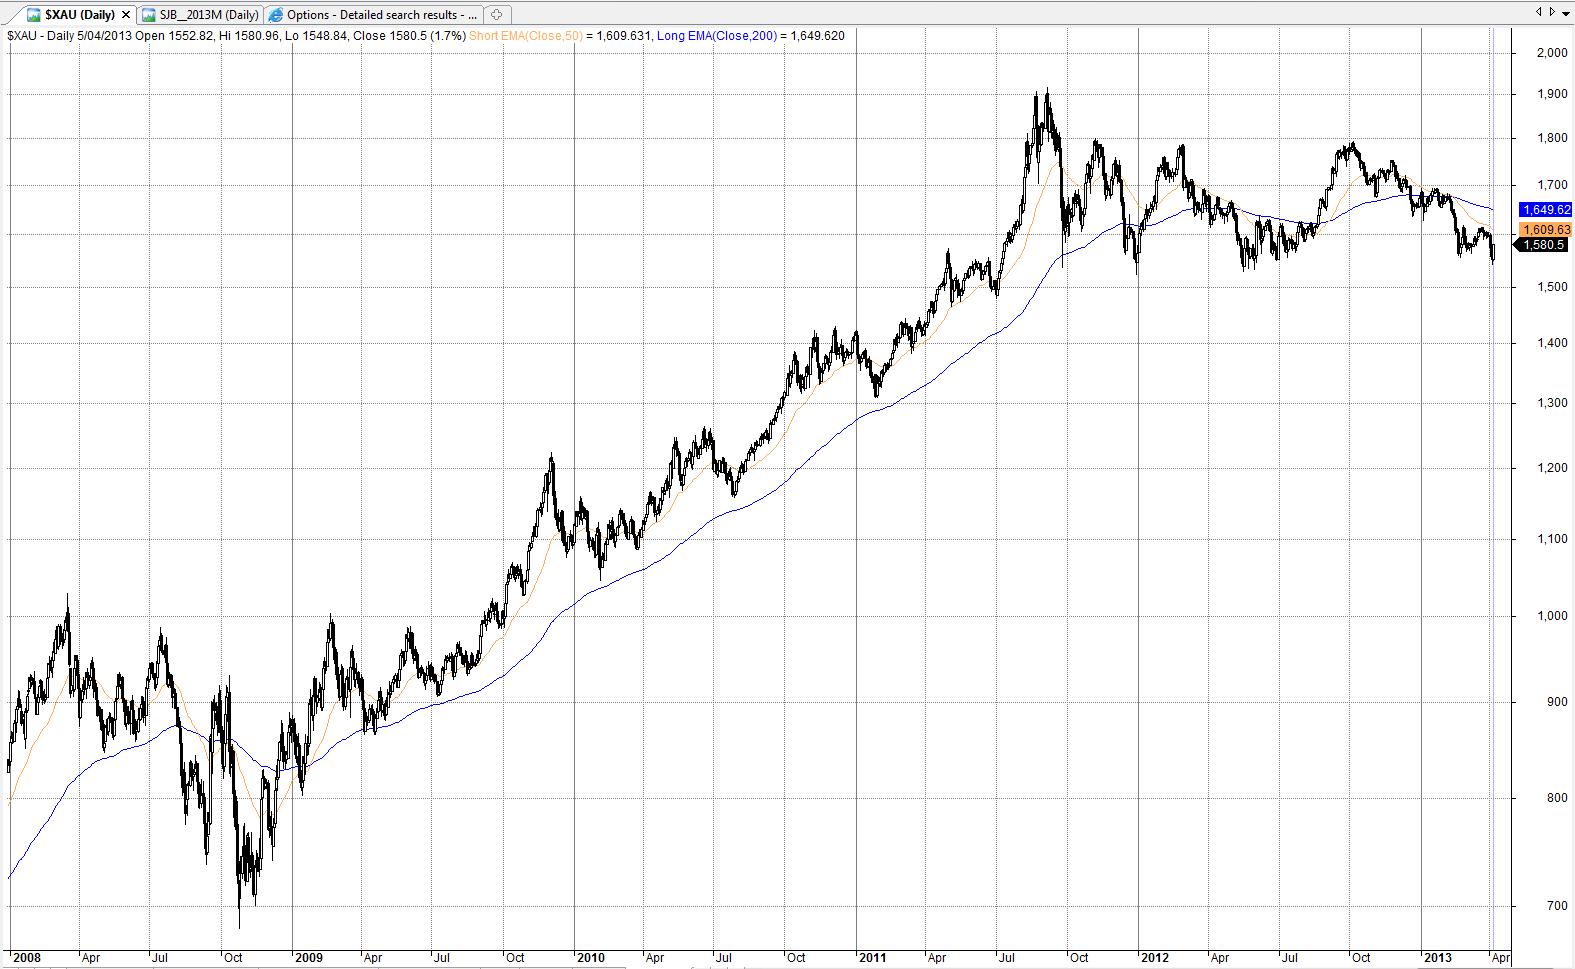 Asx options trading strategies